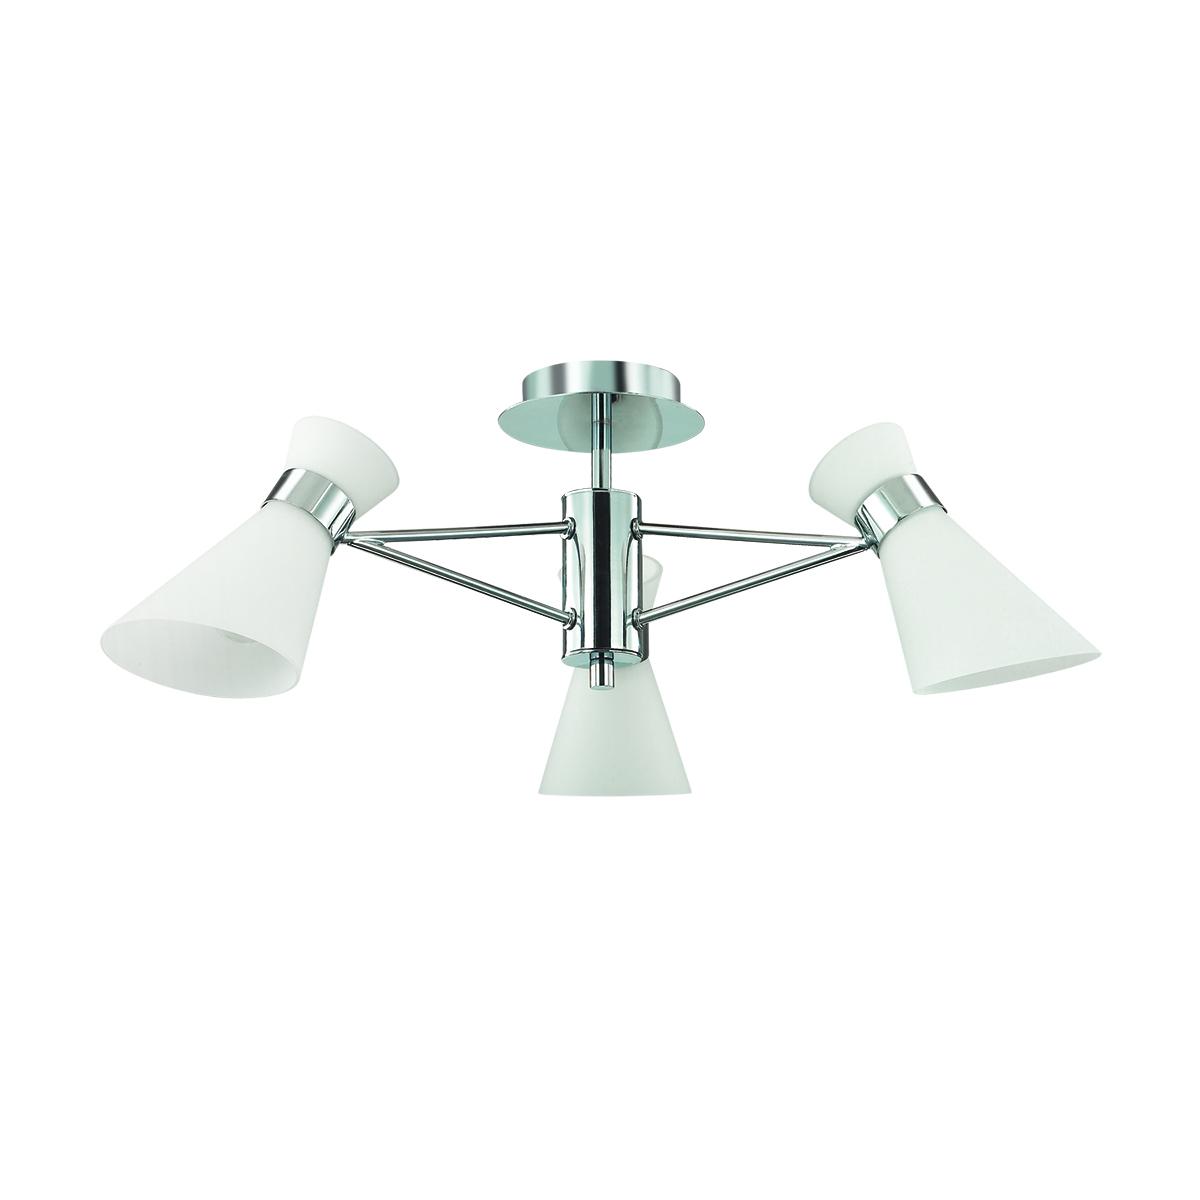 Потолочная люстра Lumion Moderni Laconica 3498/3, 3xE14x40W, хром, белый, металл, стекло - фото 2